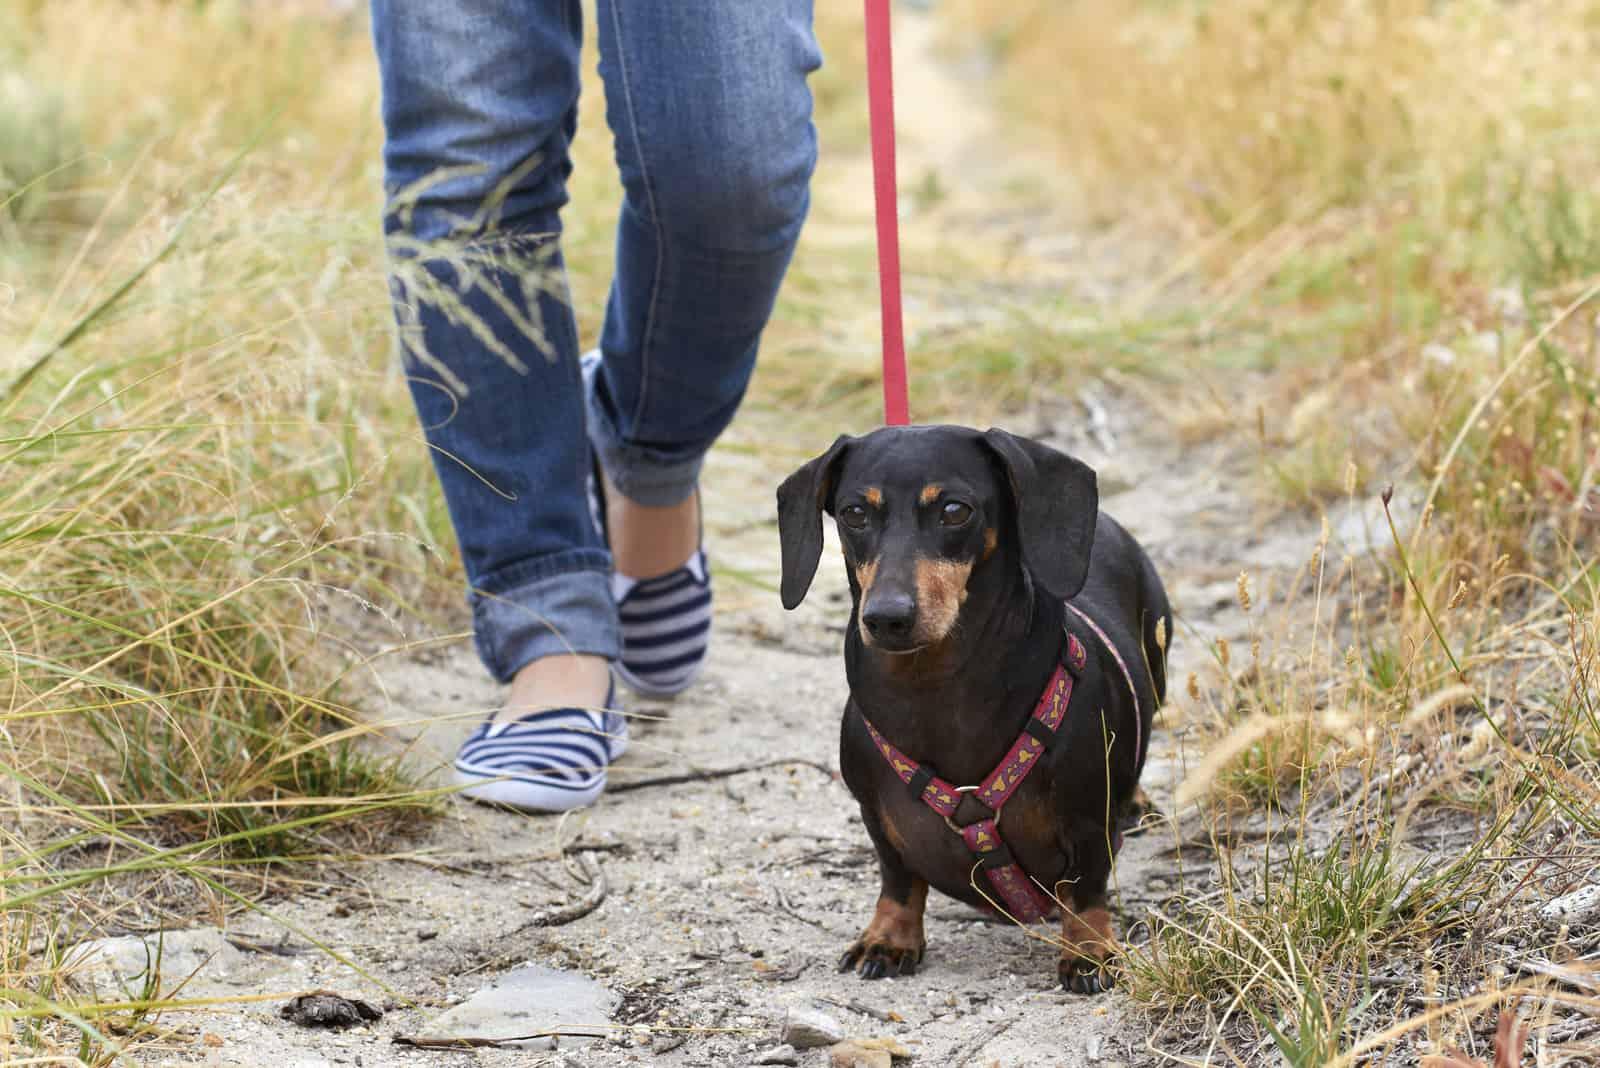 Dachshund dog walking with owner